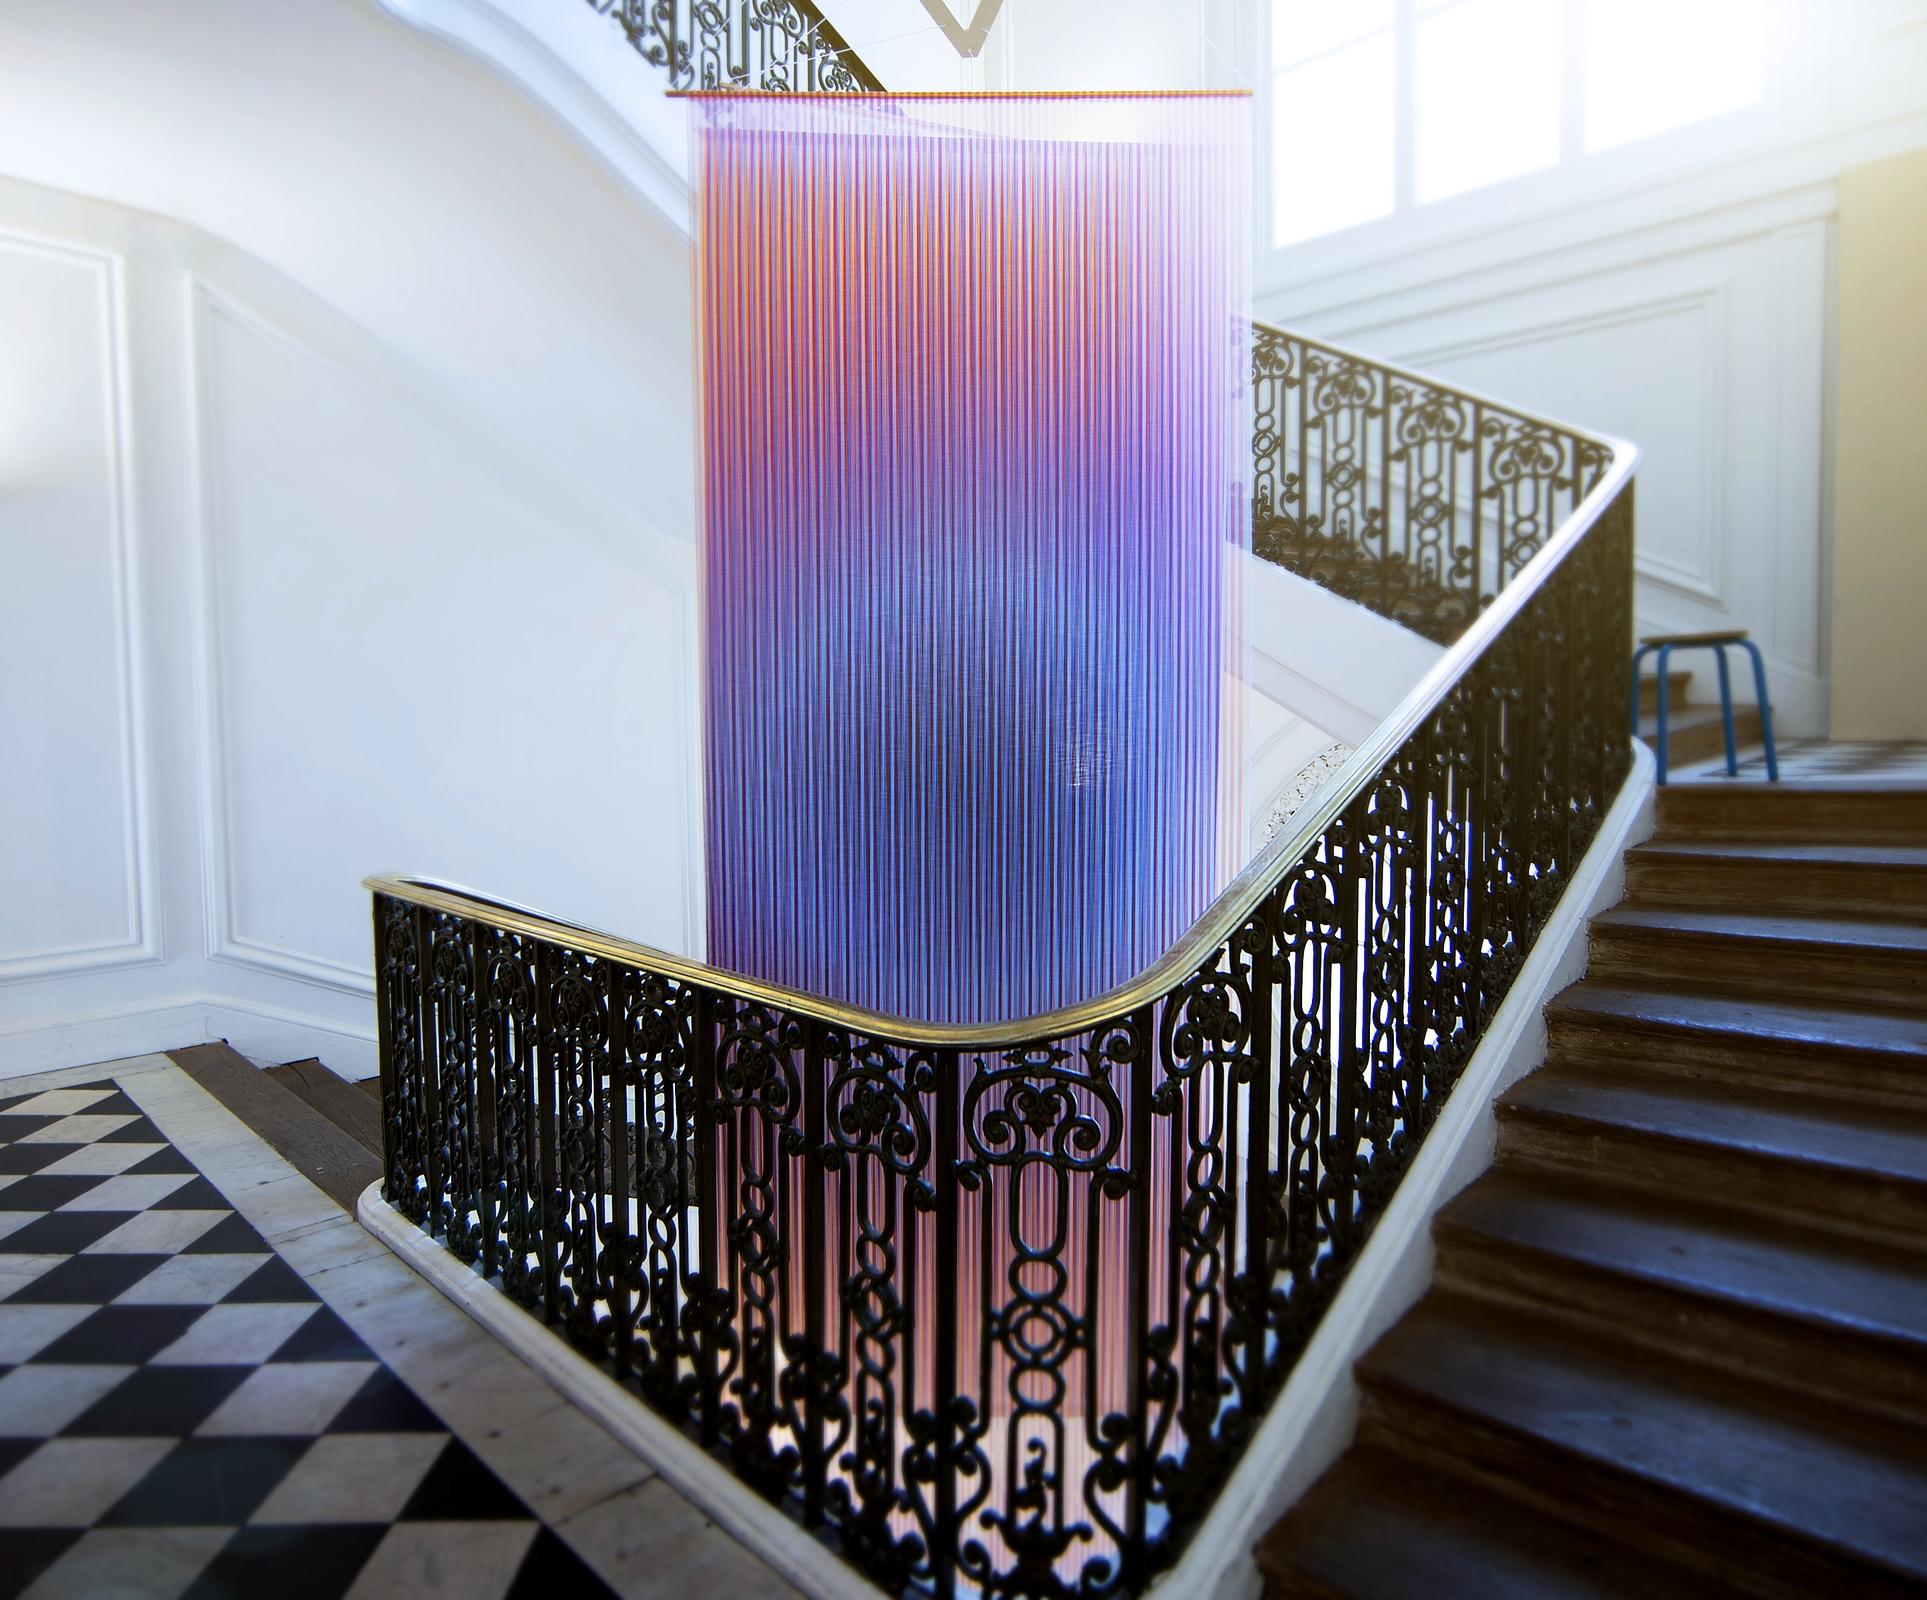 RiveRoshan_Wayang_Tapestries_Square_Photo_credit_FloorKnaapen.jpg